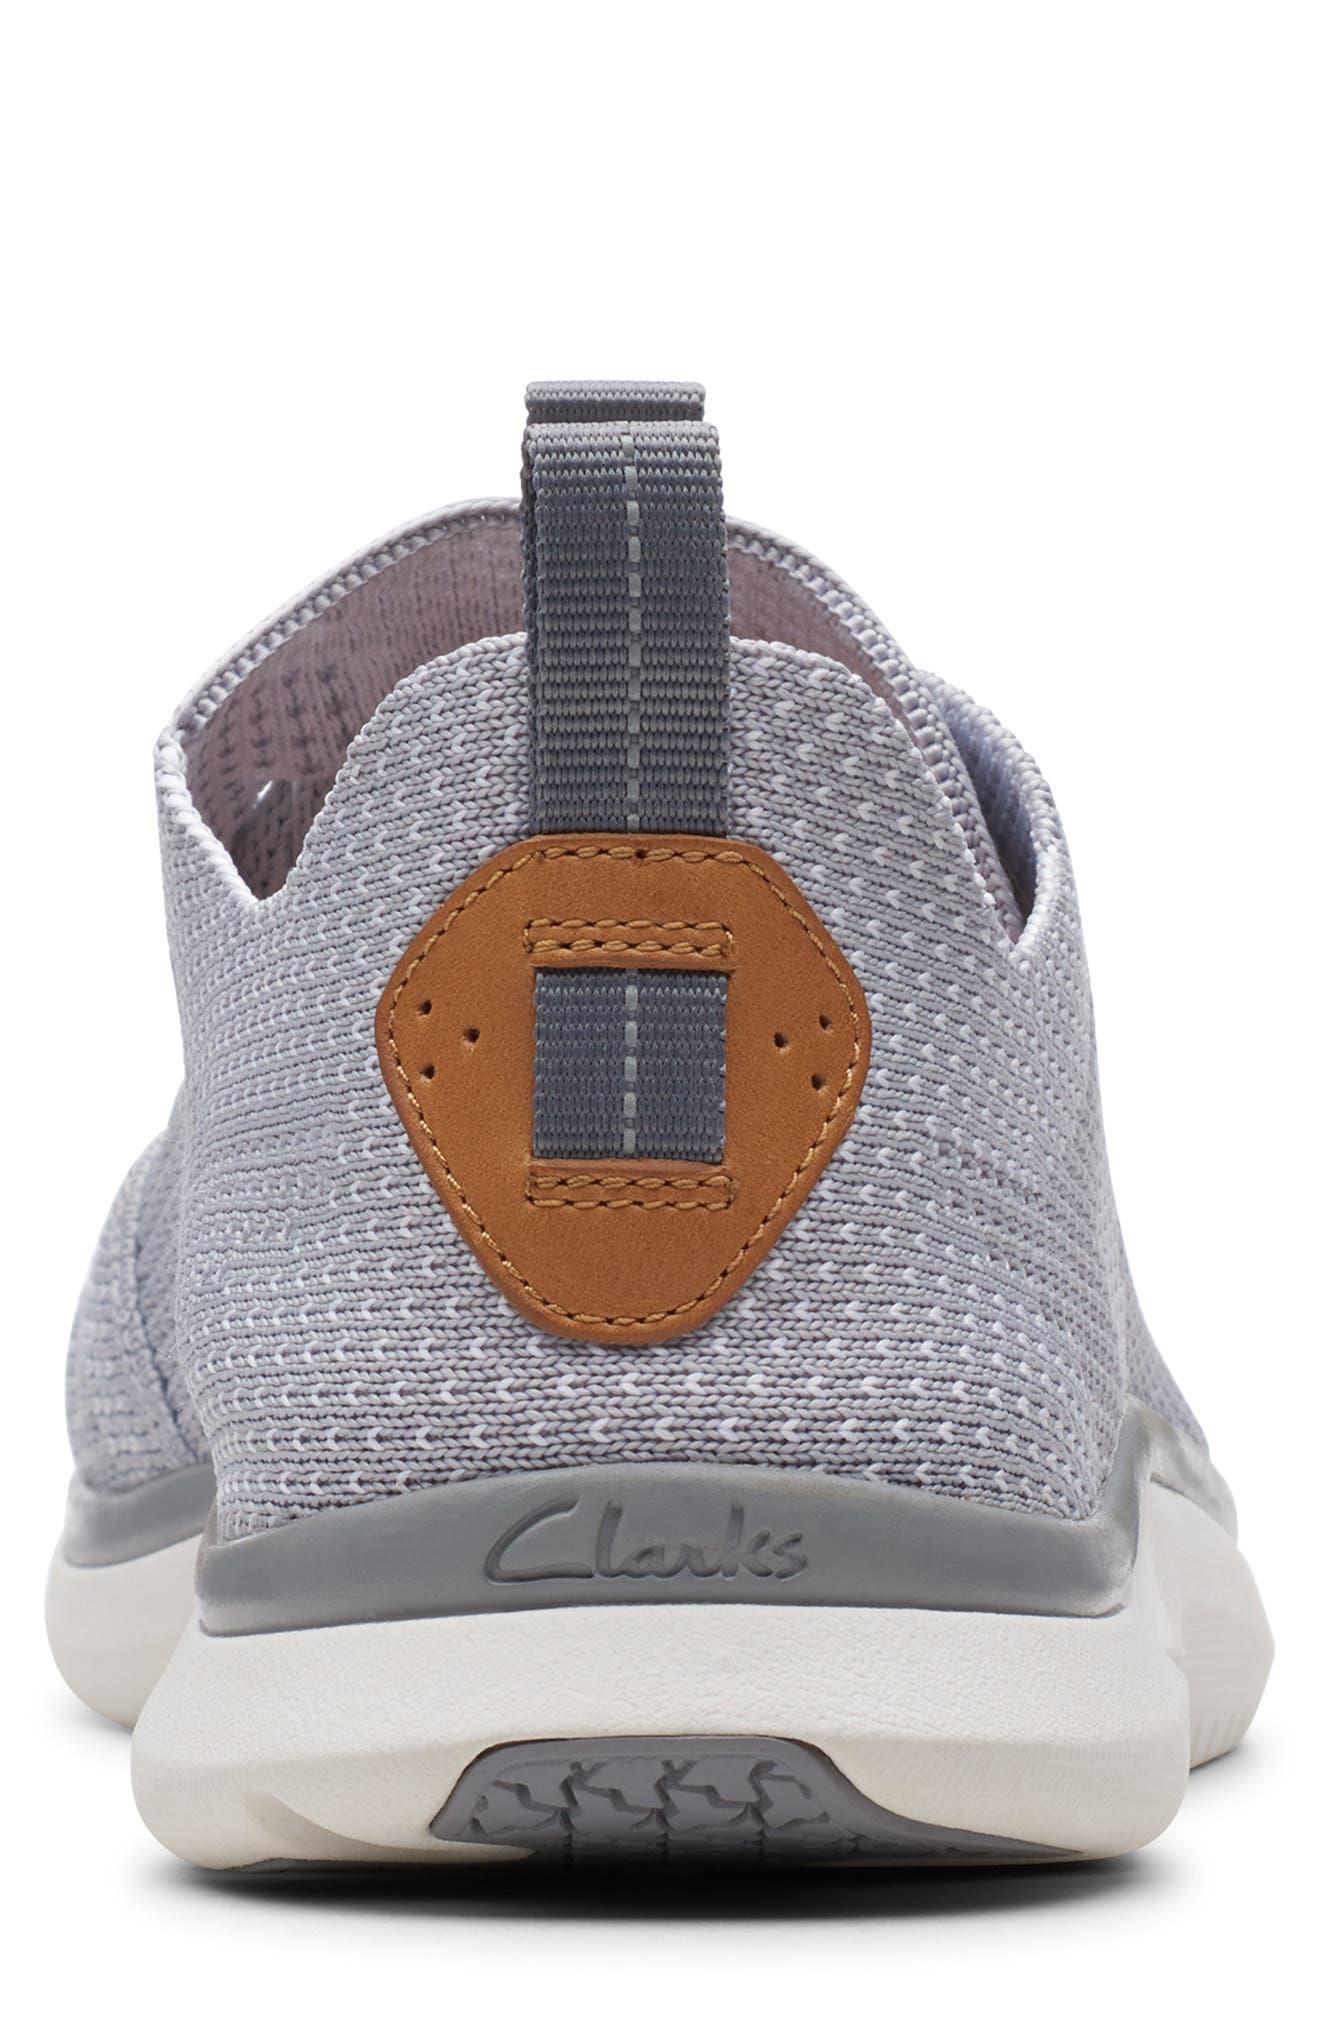 CLARKS<SUP>®</SUP>, Triken Run Sneaker, Alternate thumbnail 4, color, GREY